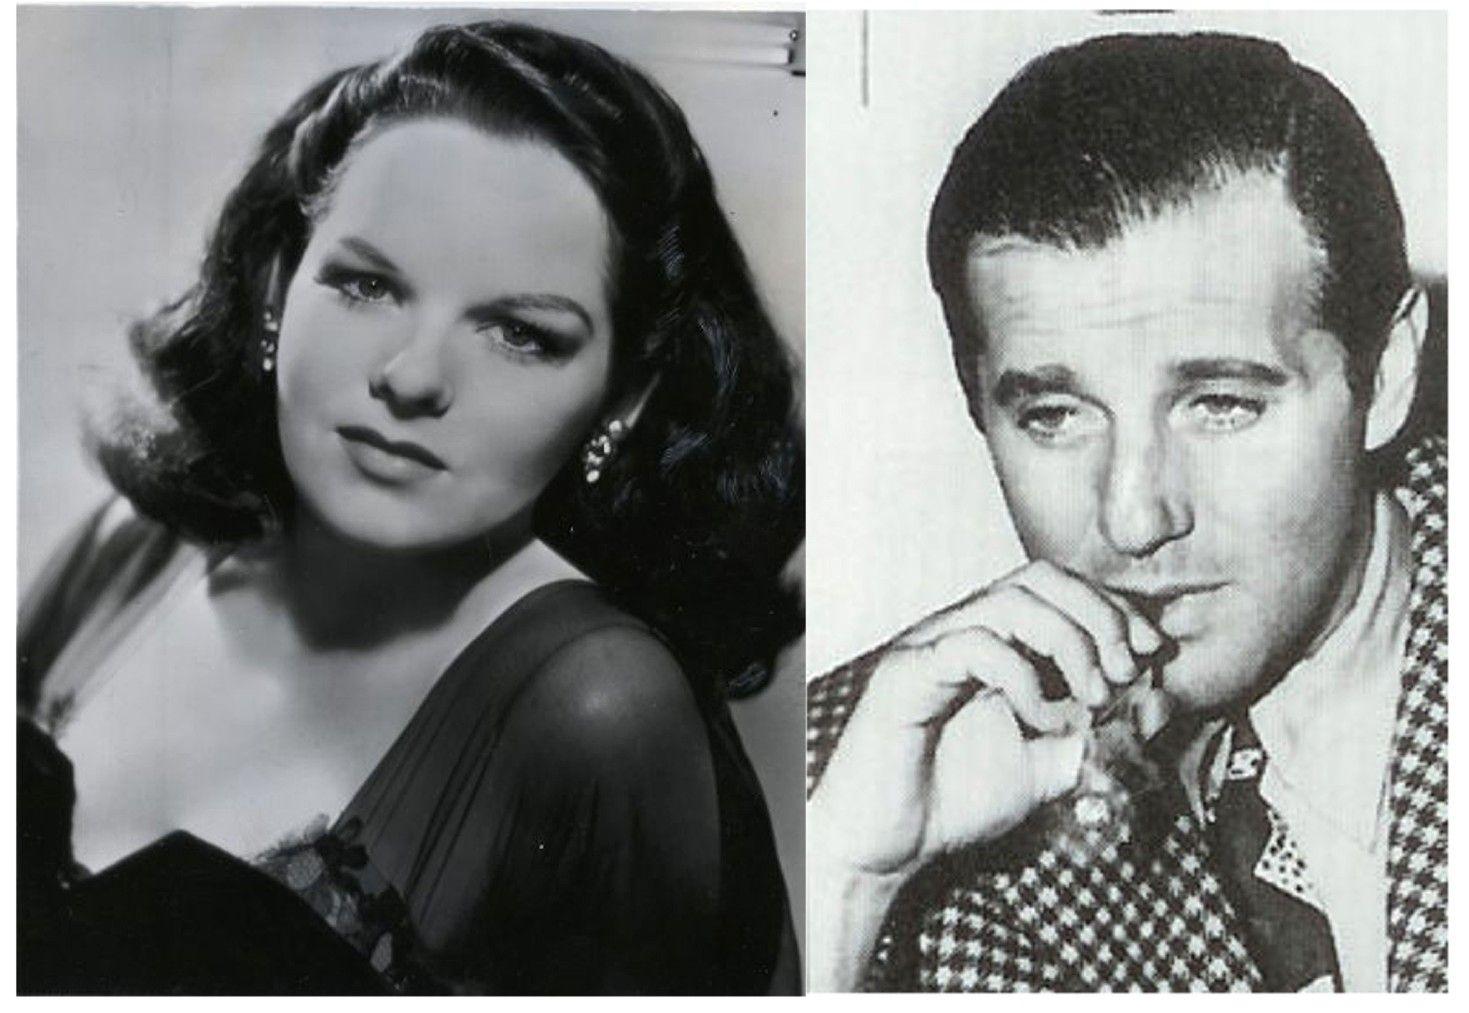 Virginia Hill And Bugsy Siegel She Looks Like Such A Nice Girl